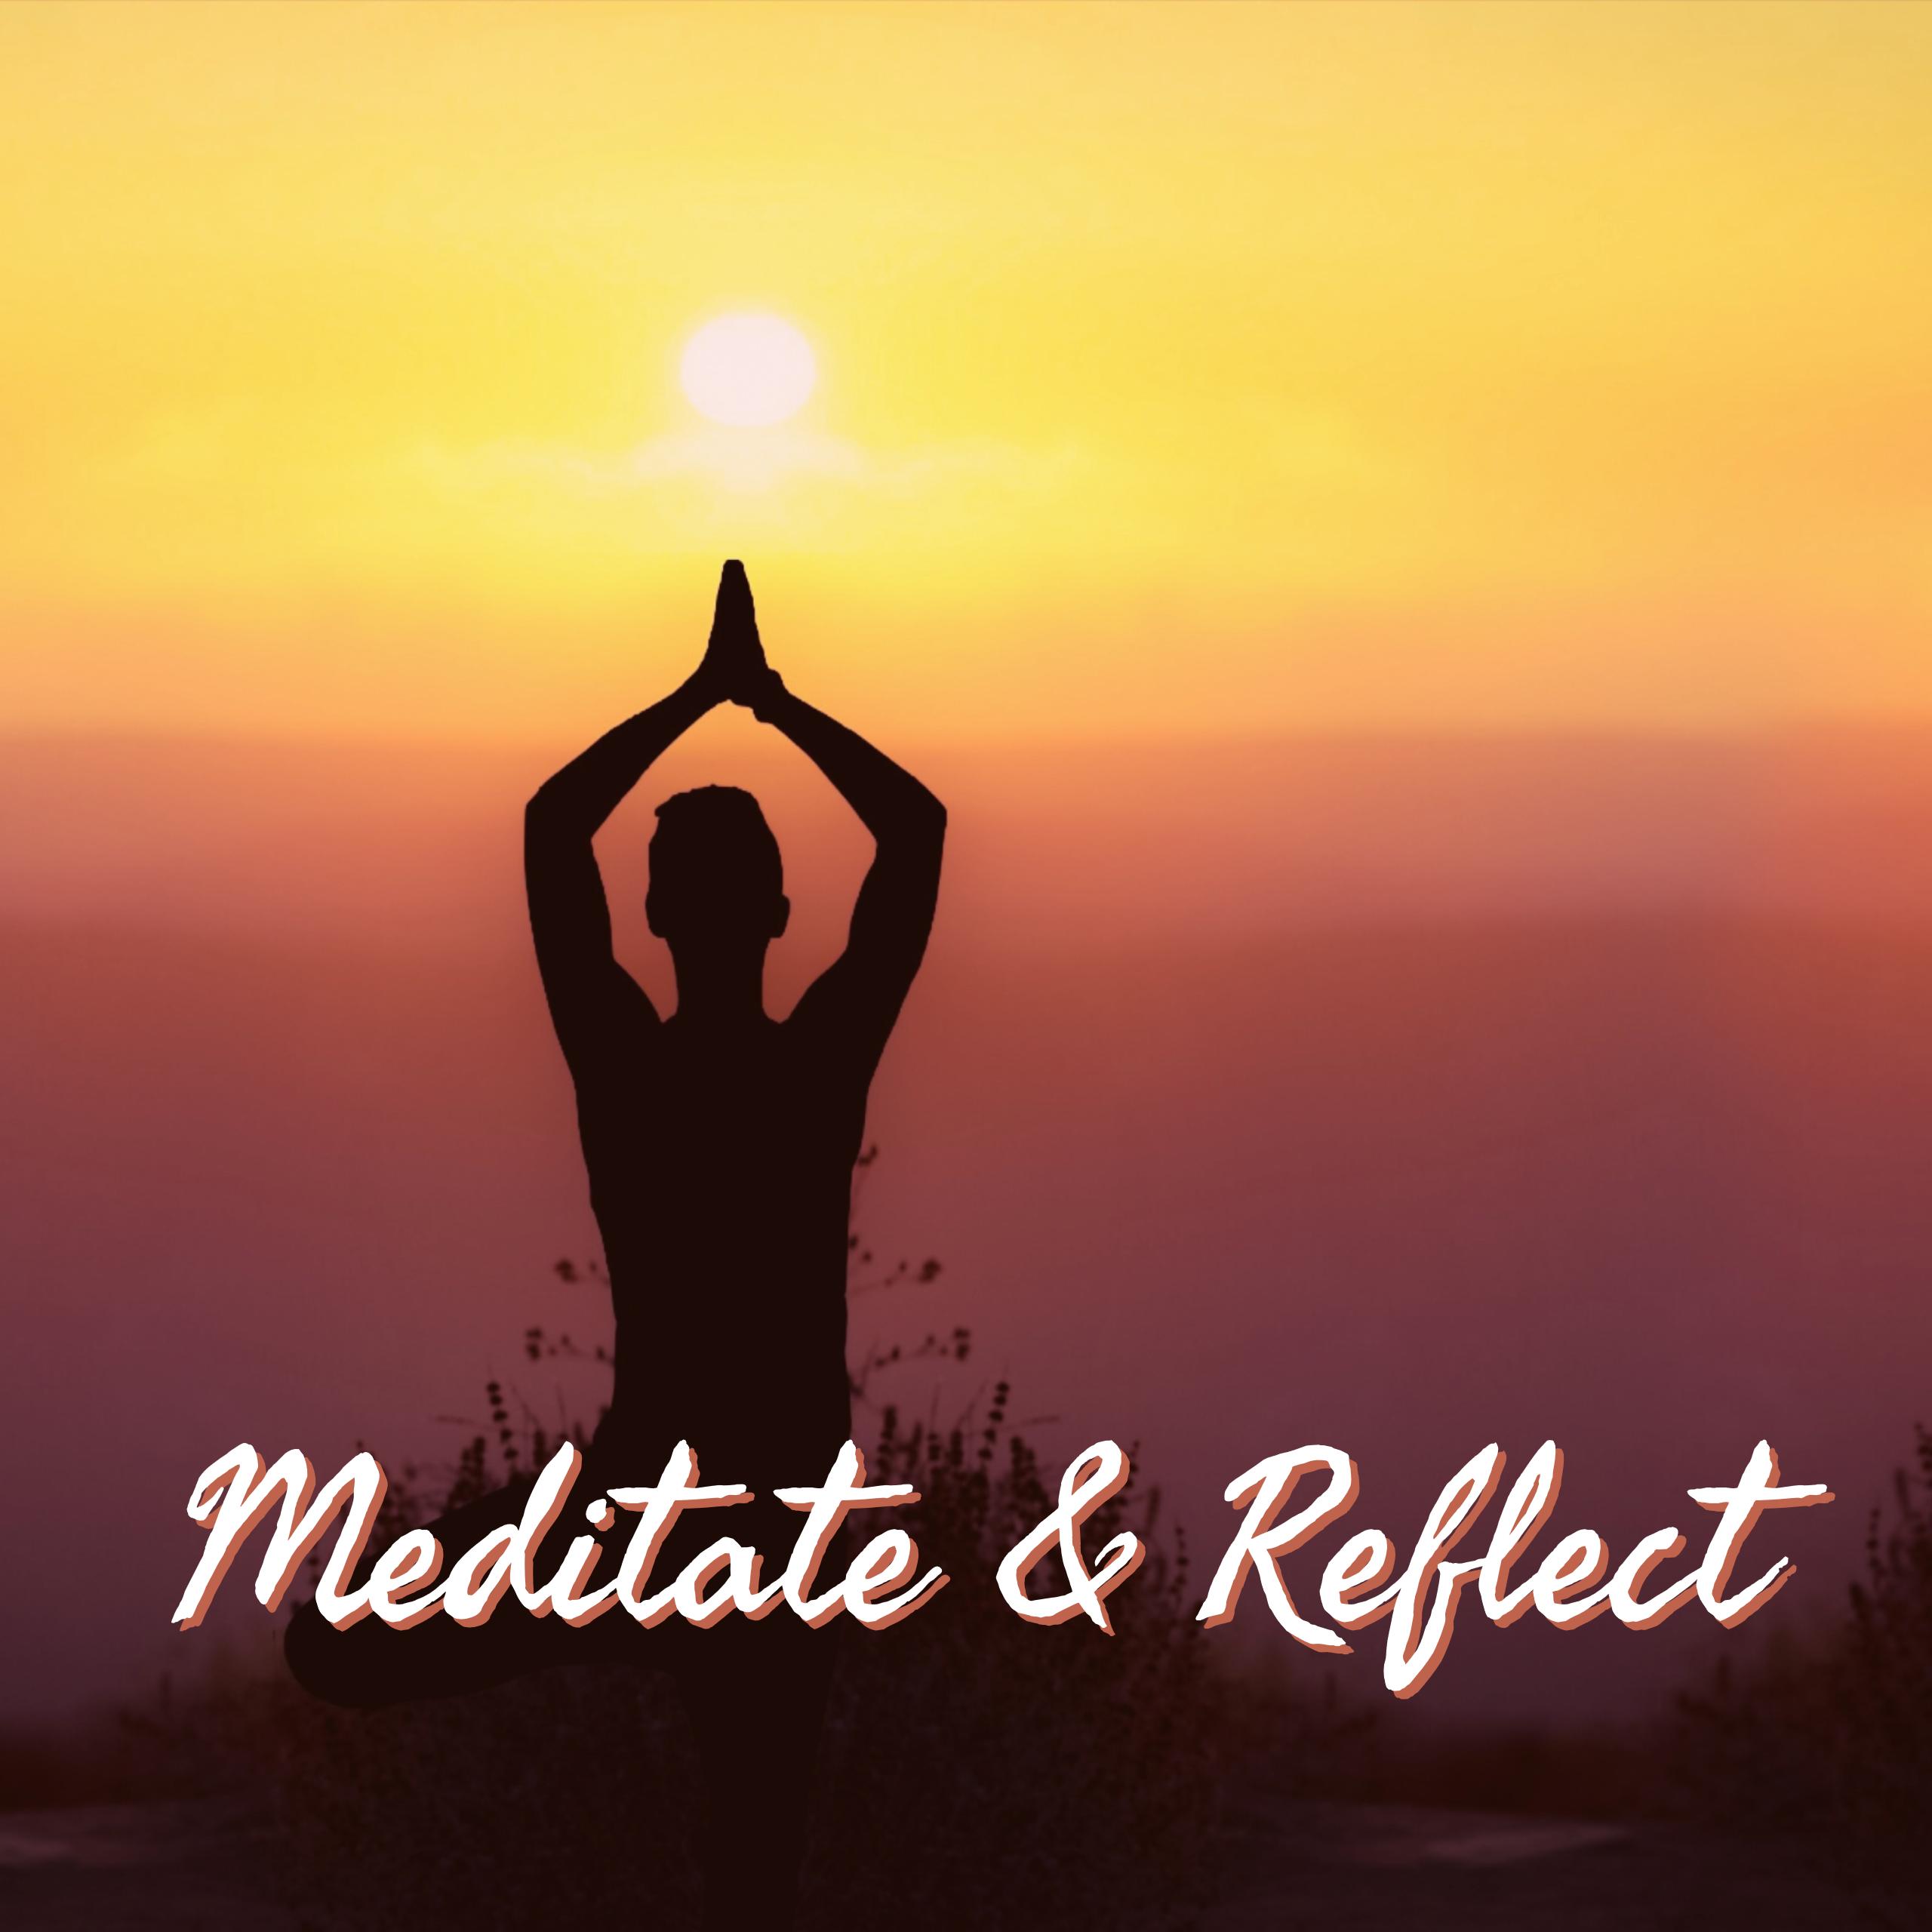 Supported Meditation